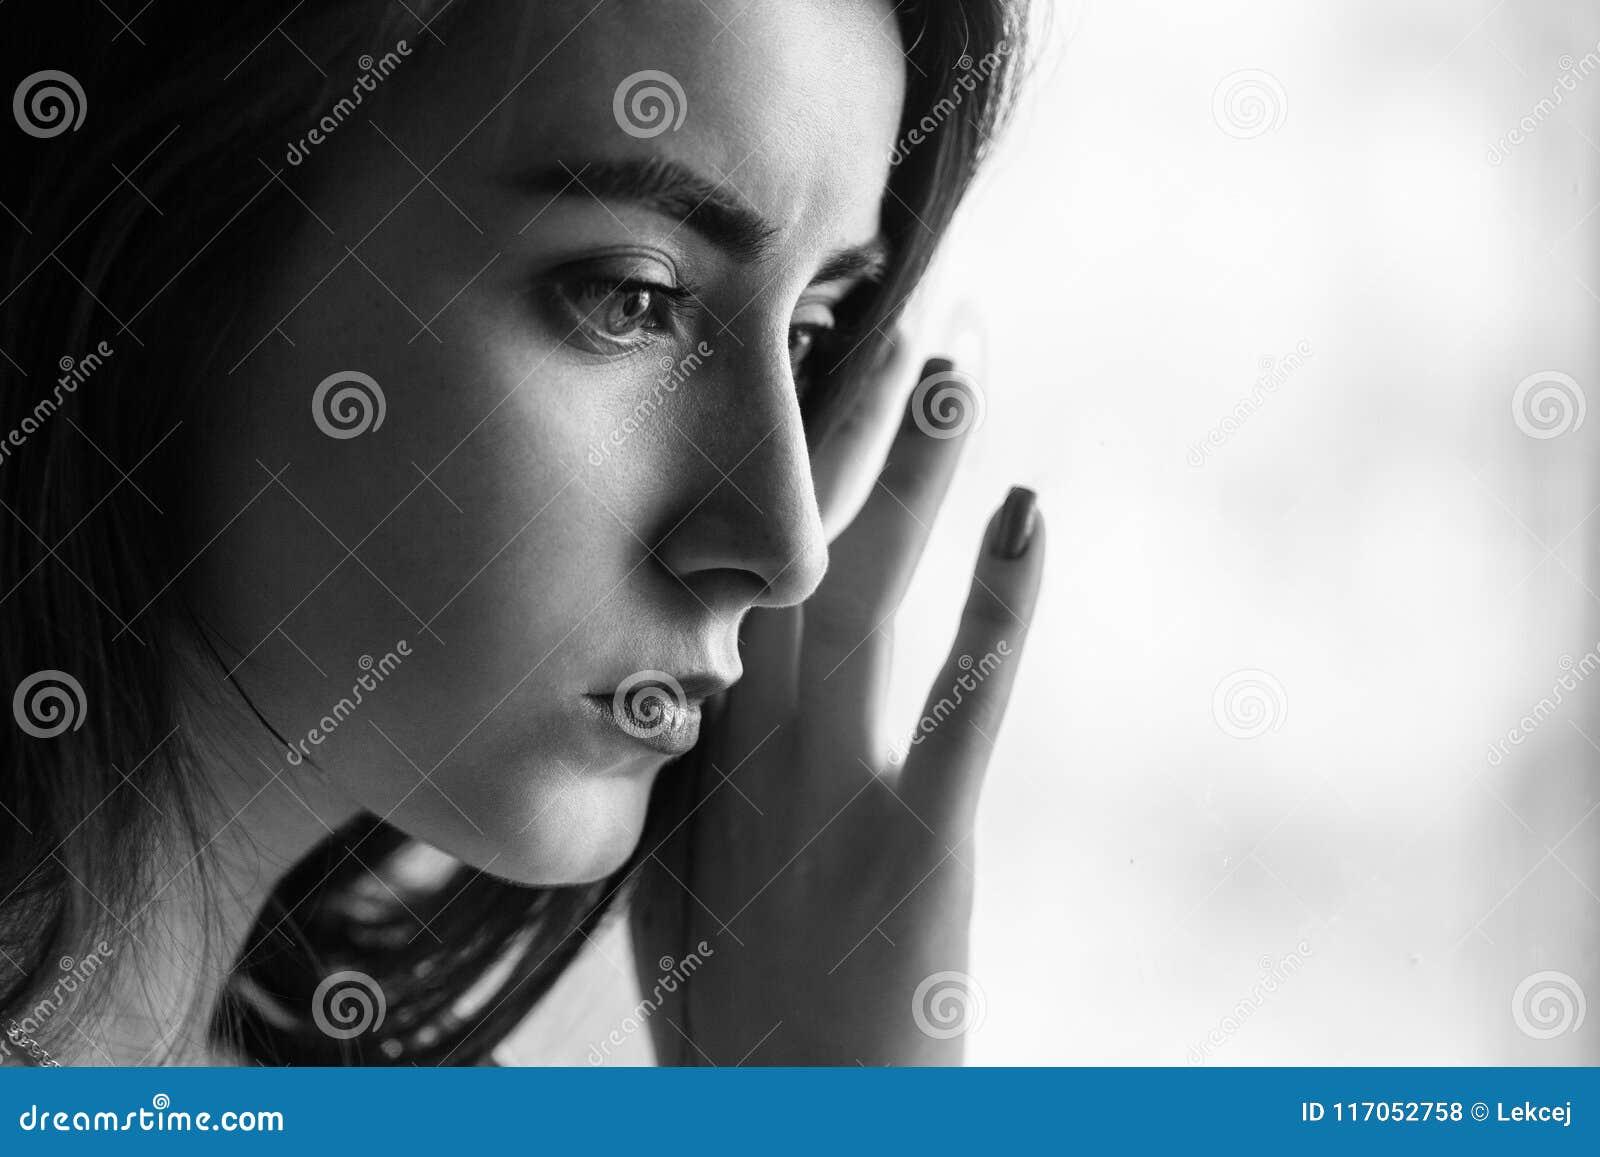 Sad female portrait